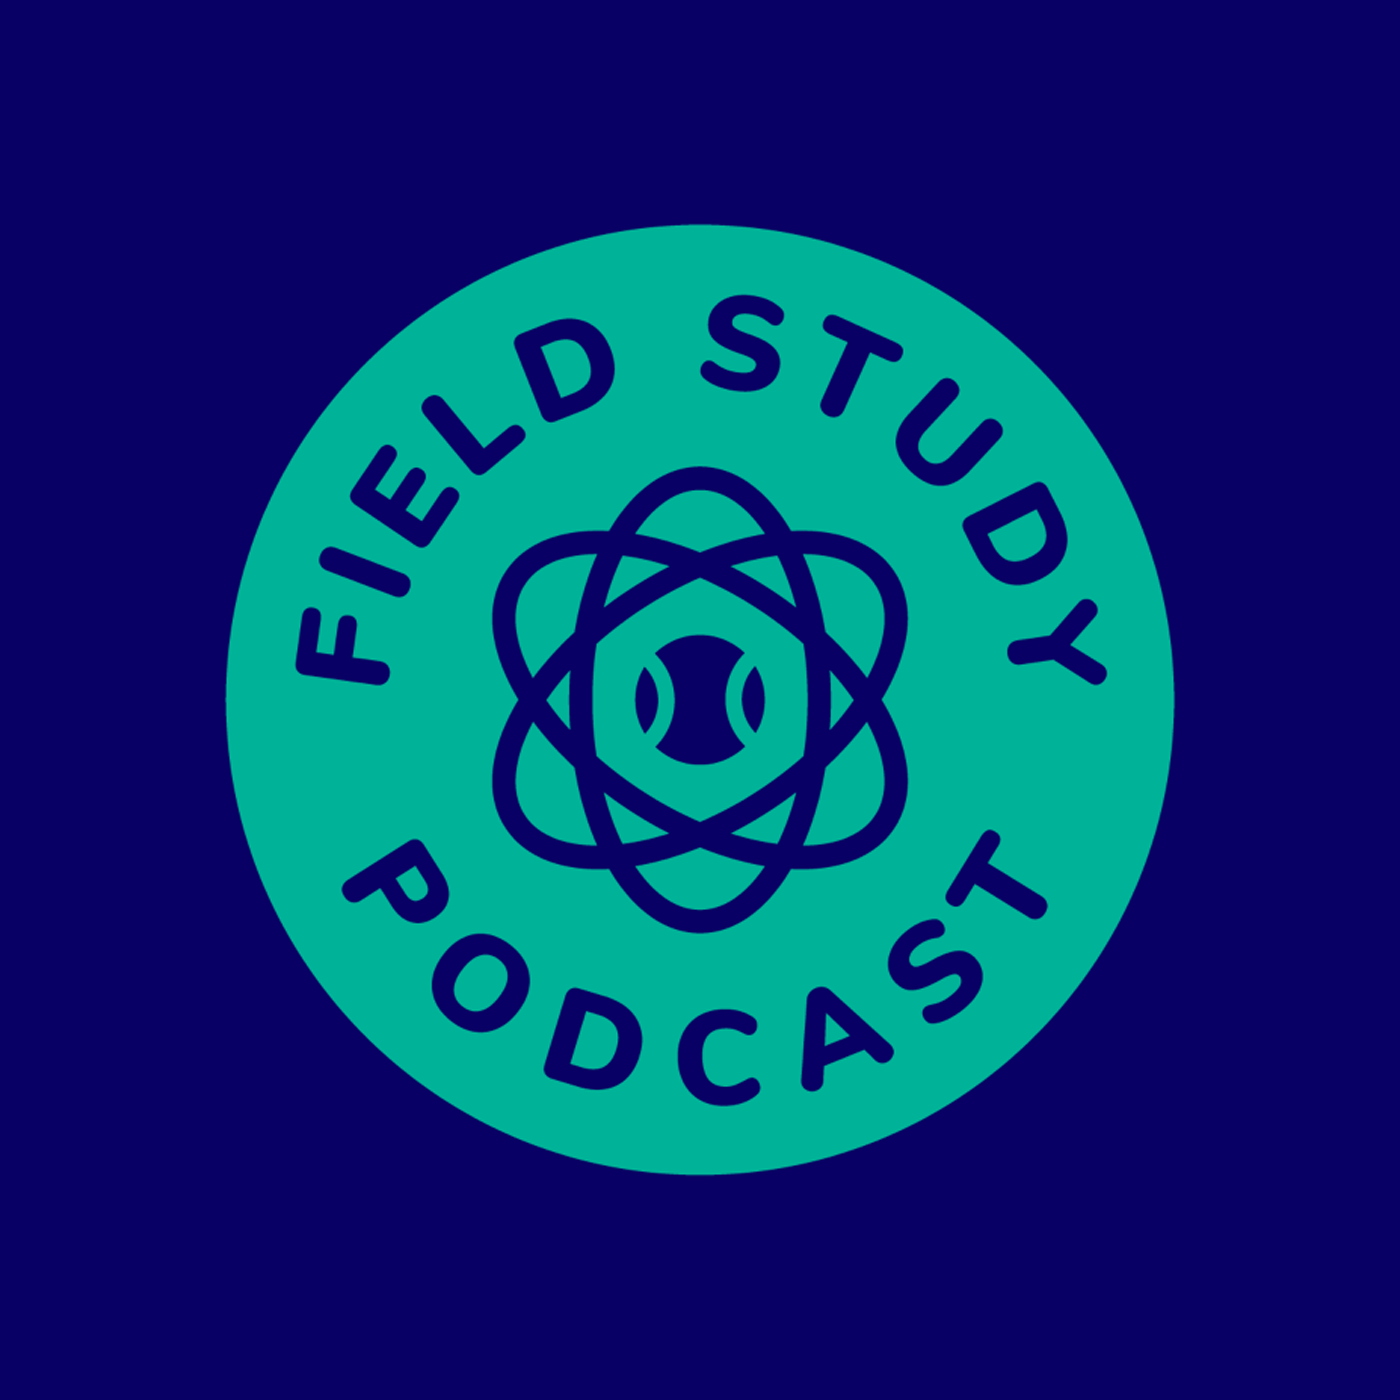 Trailer: Field Study, where science intercepts sports